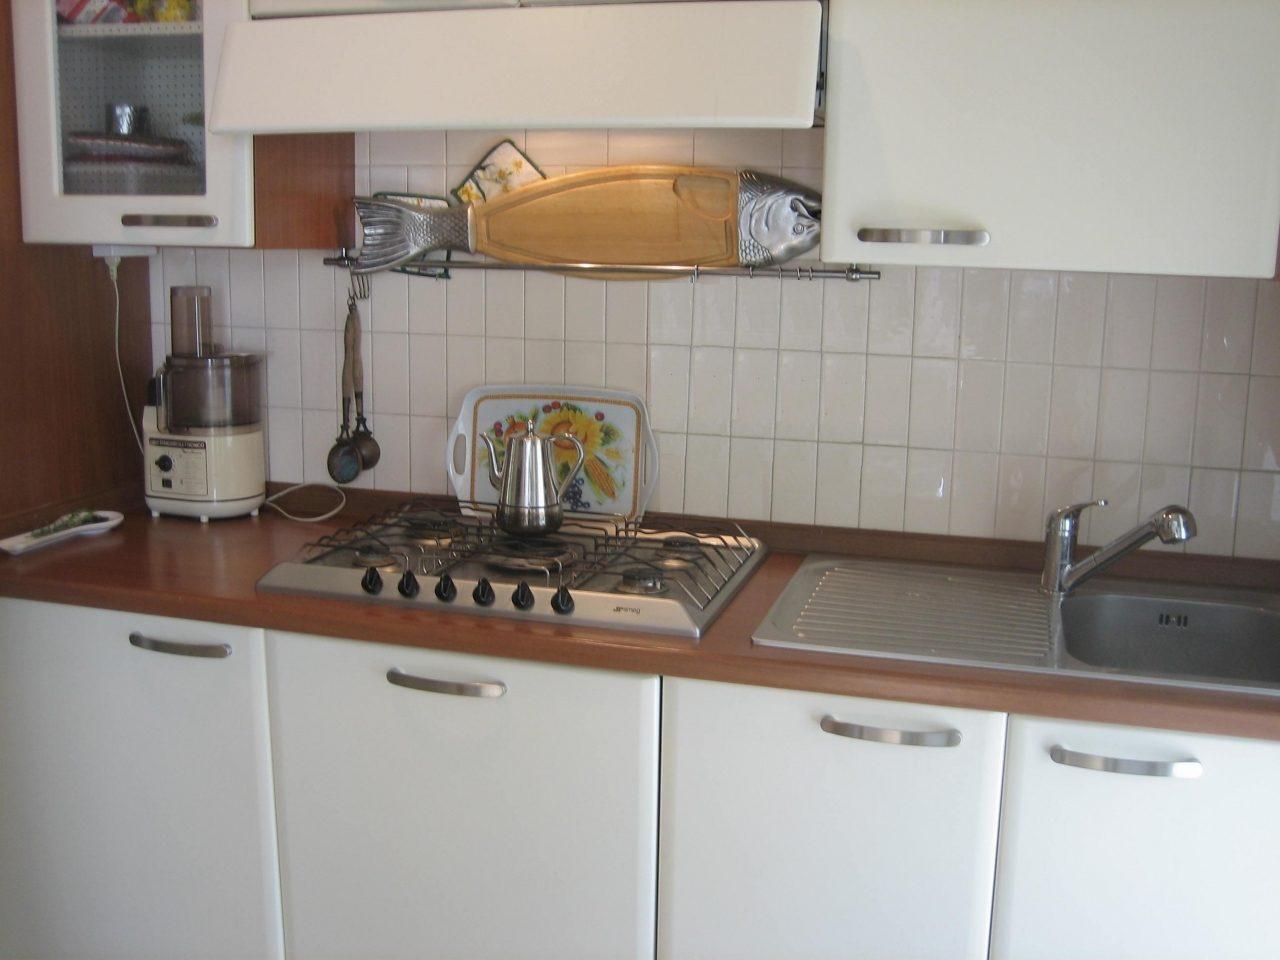 Bild 10 - Ferienhaus Pacengo di Lazise - Ref.: 150178-269 - Objekt 150178-269